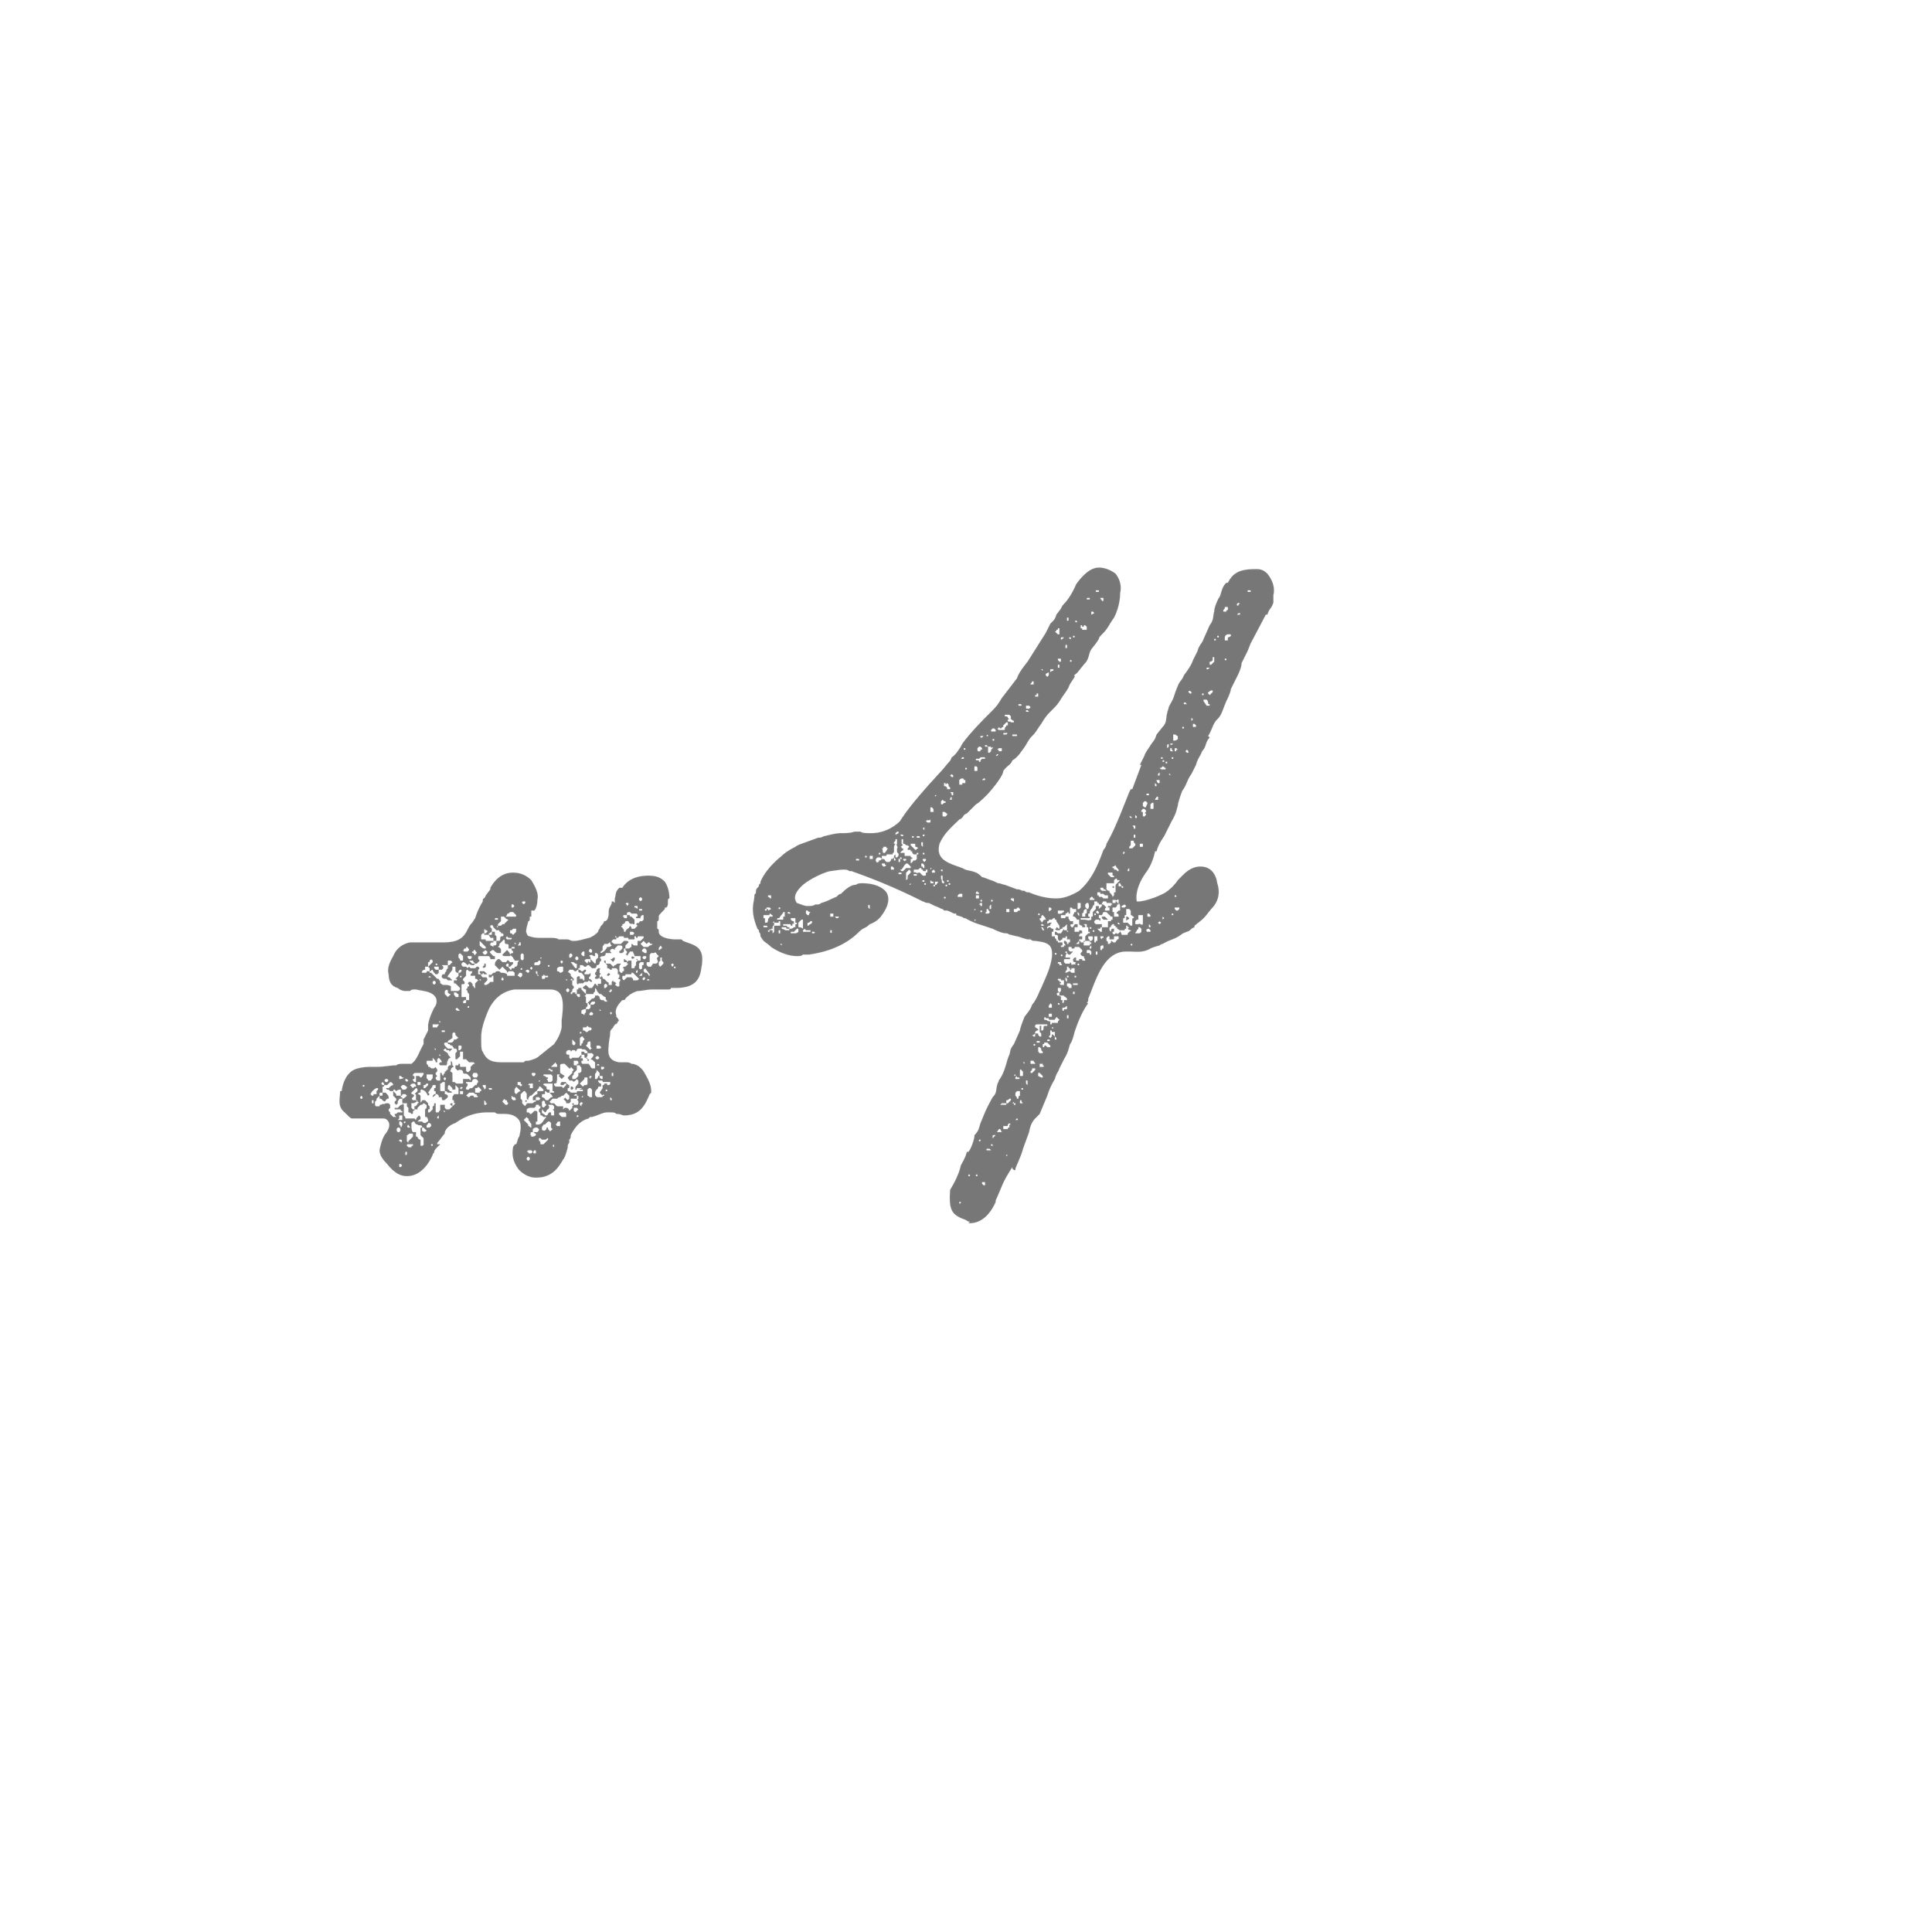 Hangover Branding Ideas-28.png